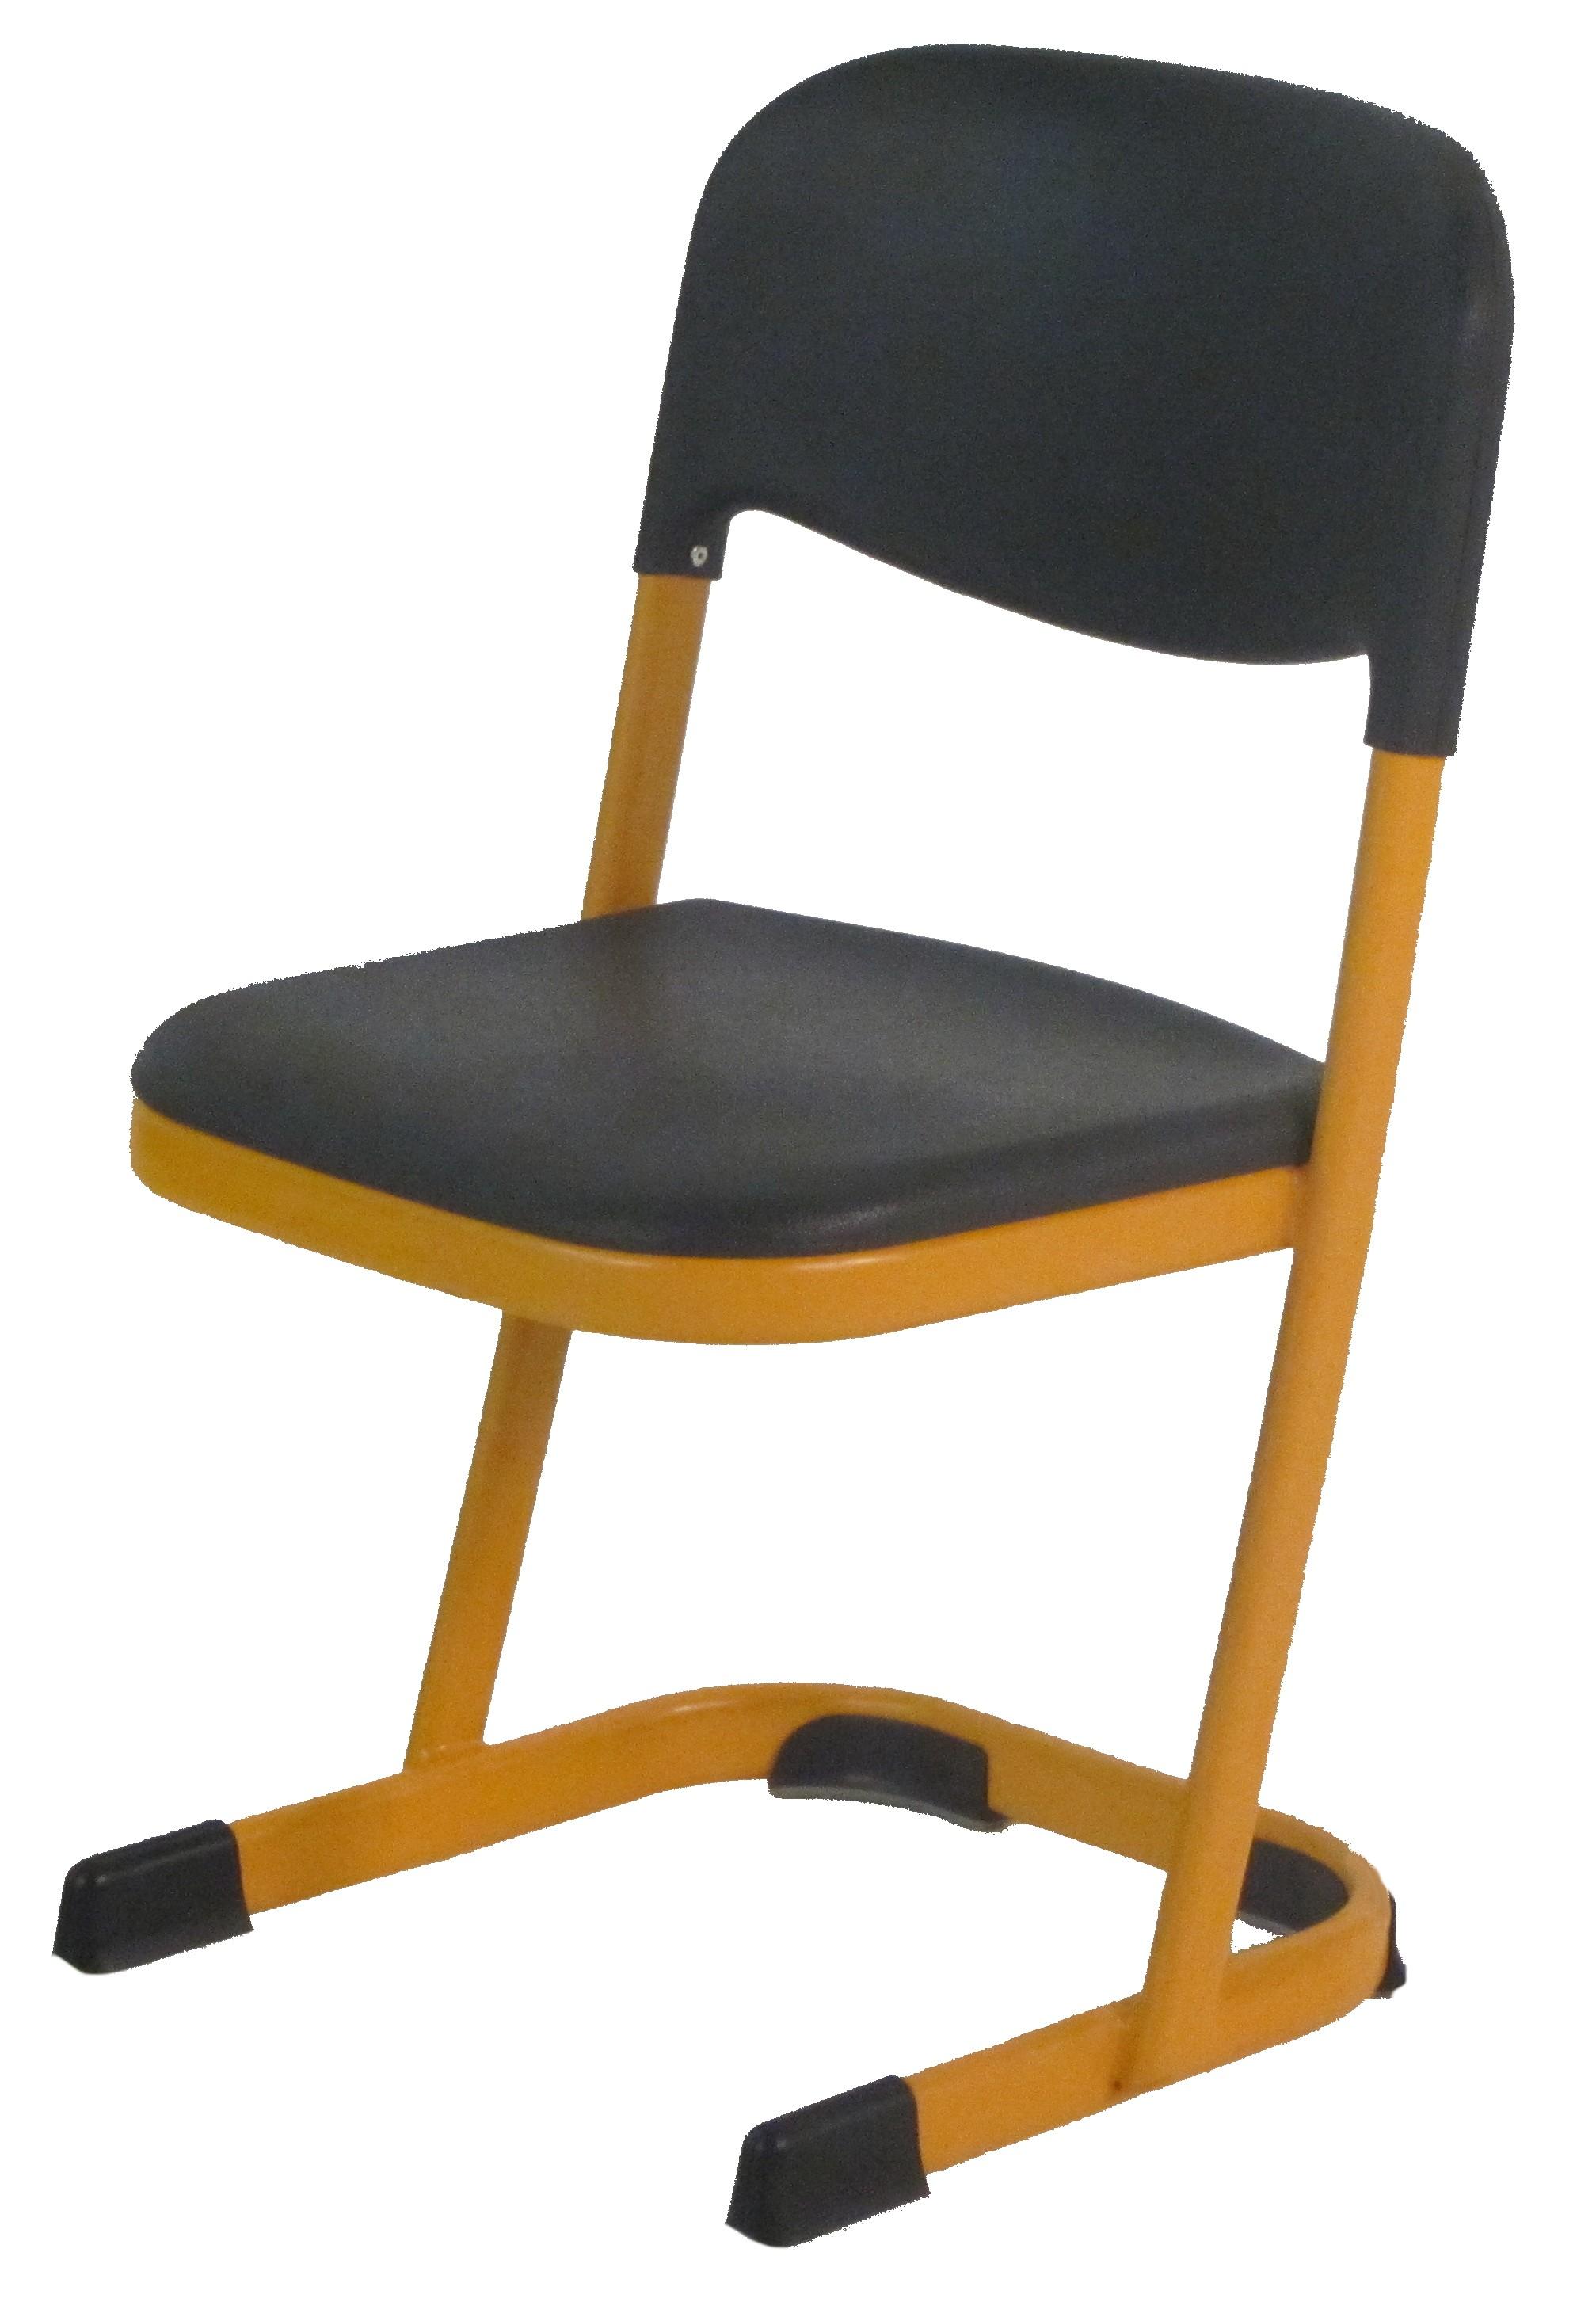 stuhl orange beautiful weizen liegestuhl stuhl aus holz. Black Bedroom Furniture Sets. Home Design Ideas